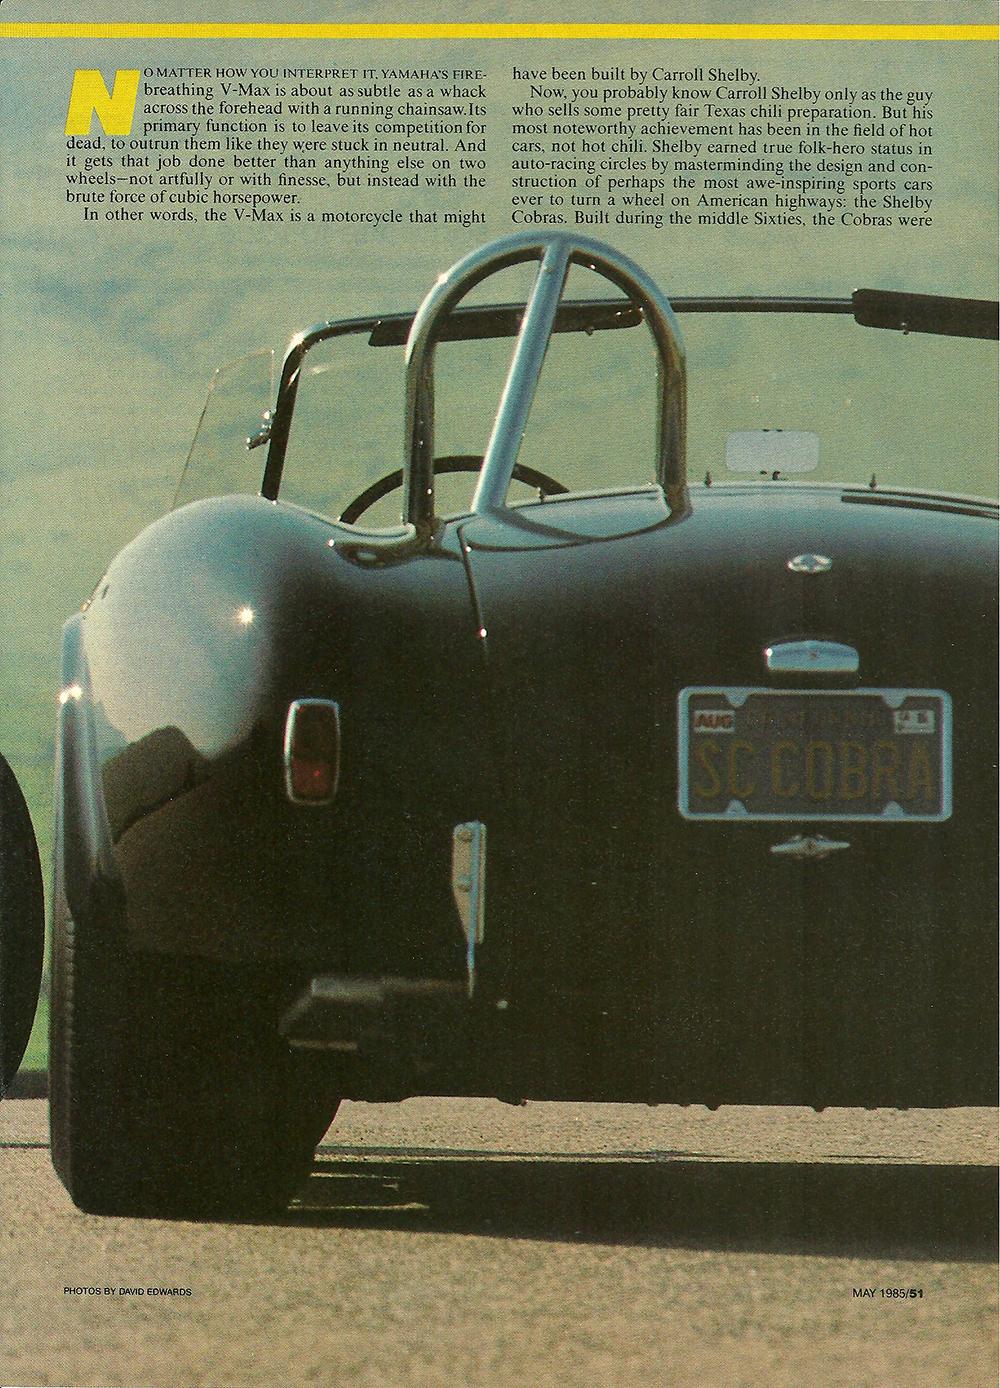 1985 Yamaha Vmax vs 427 Cobra 02.jpg